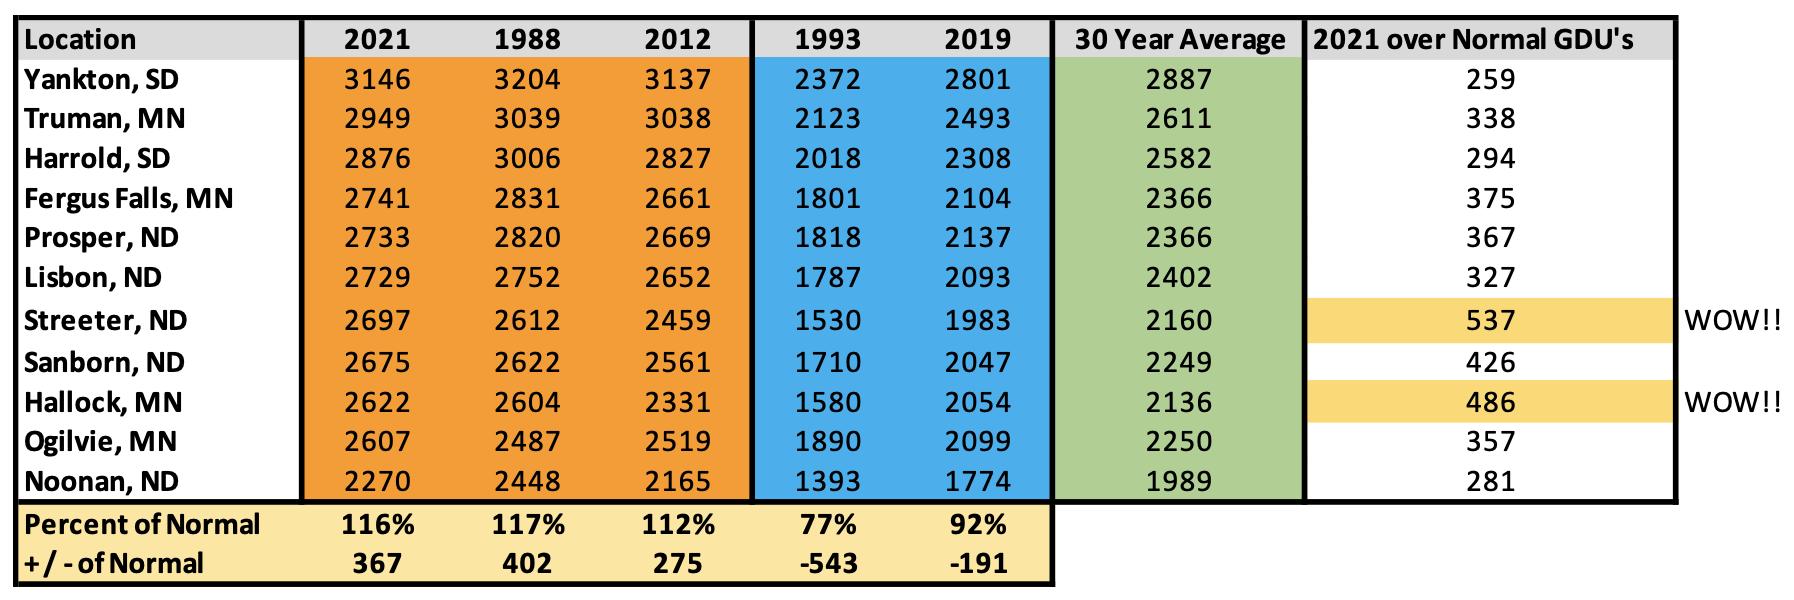 GDU comparison chart